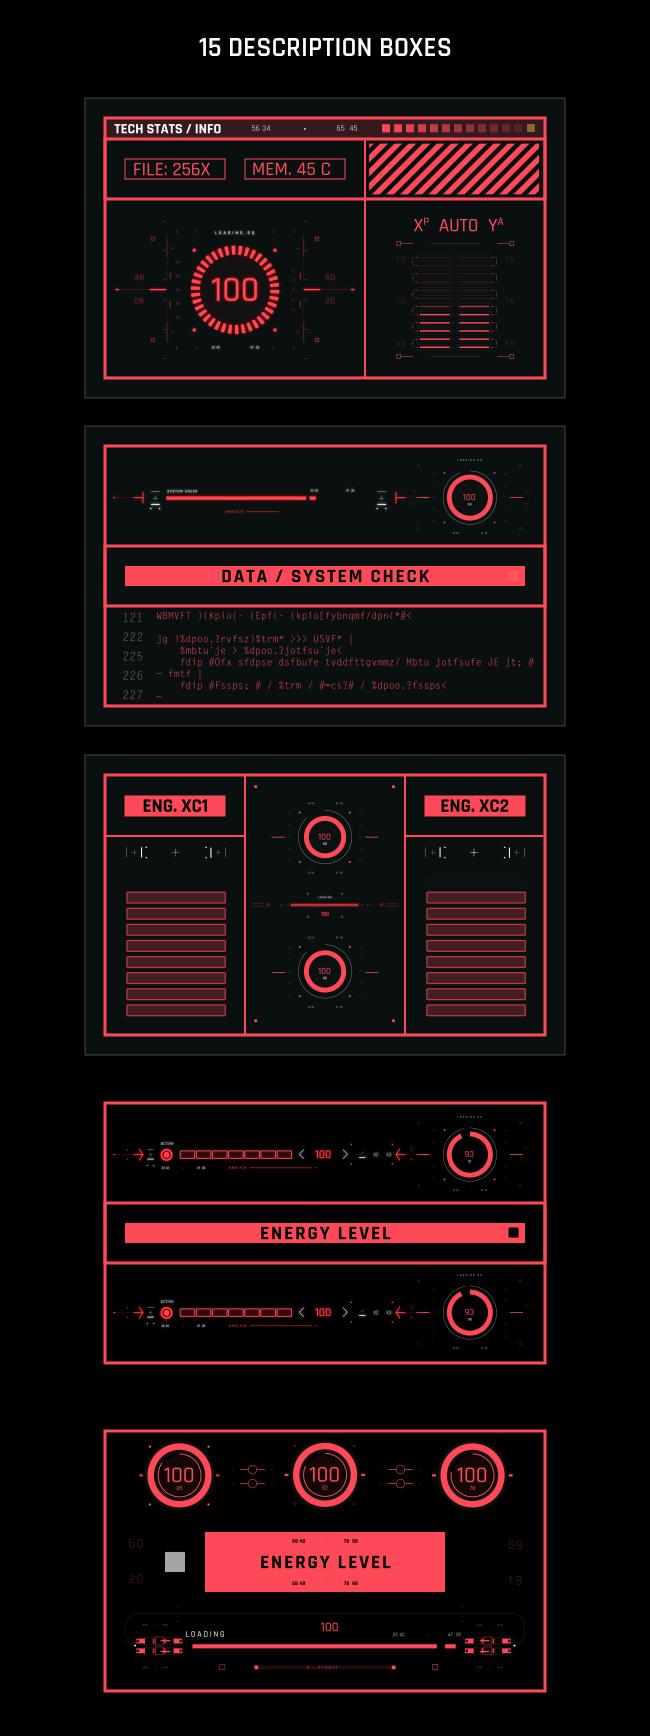 AE脚本-500个HUD高科技赛博朋克UI科幻界面元素动画预设包 Cyberpunk HUD UI 500+ 已修复中文版AE表达式报错插图34